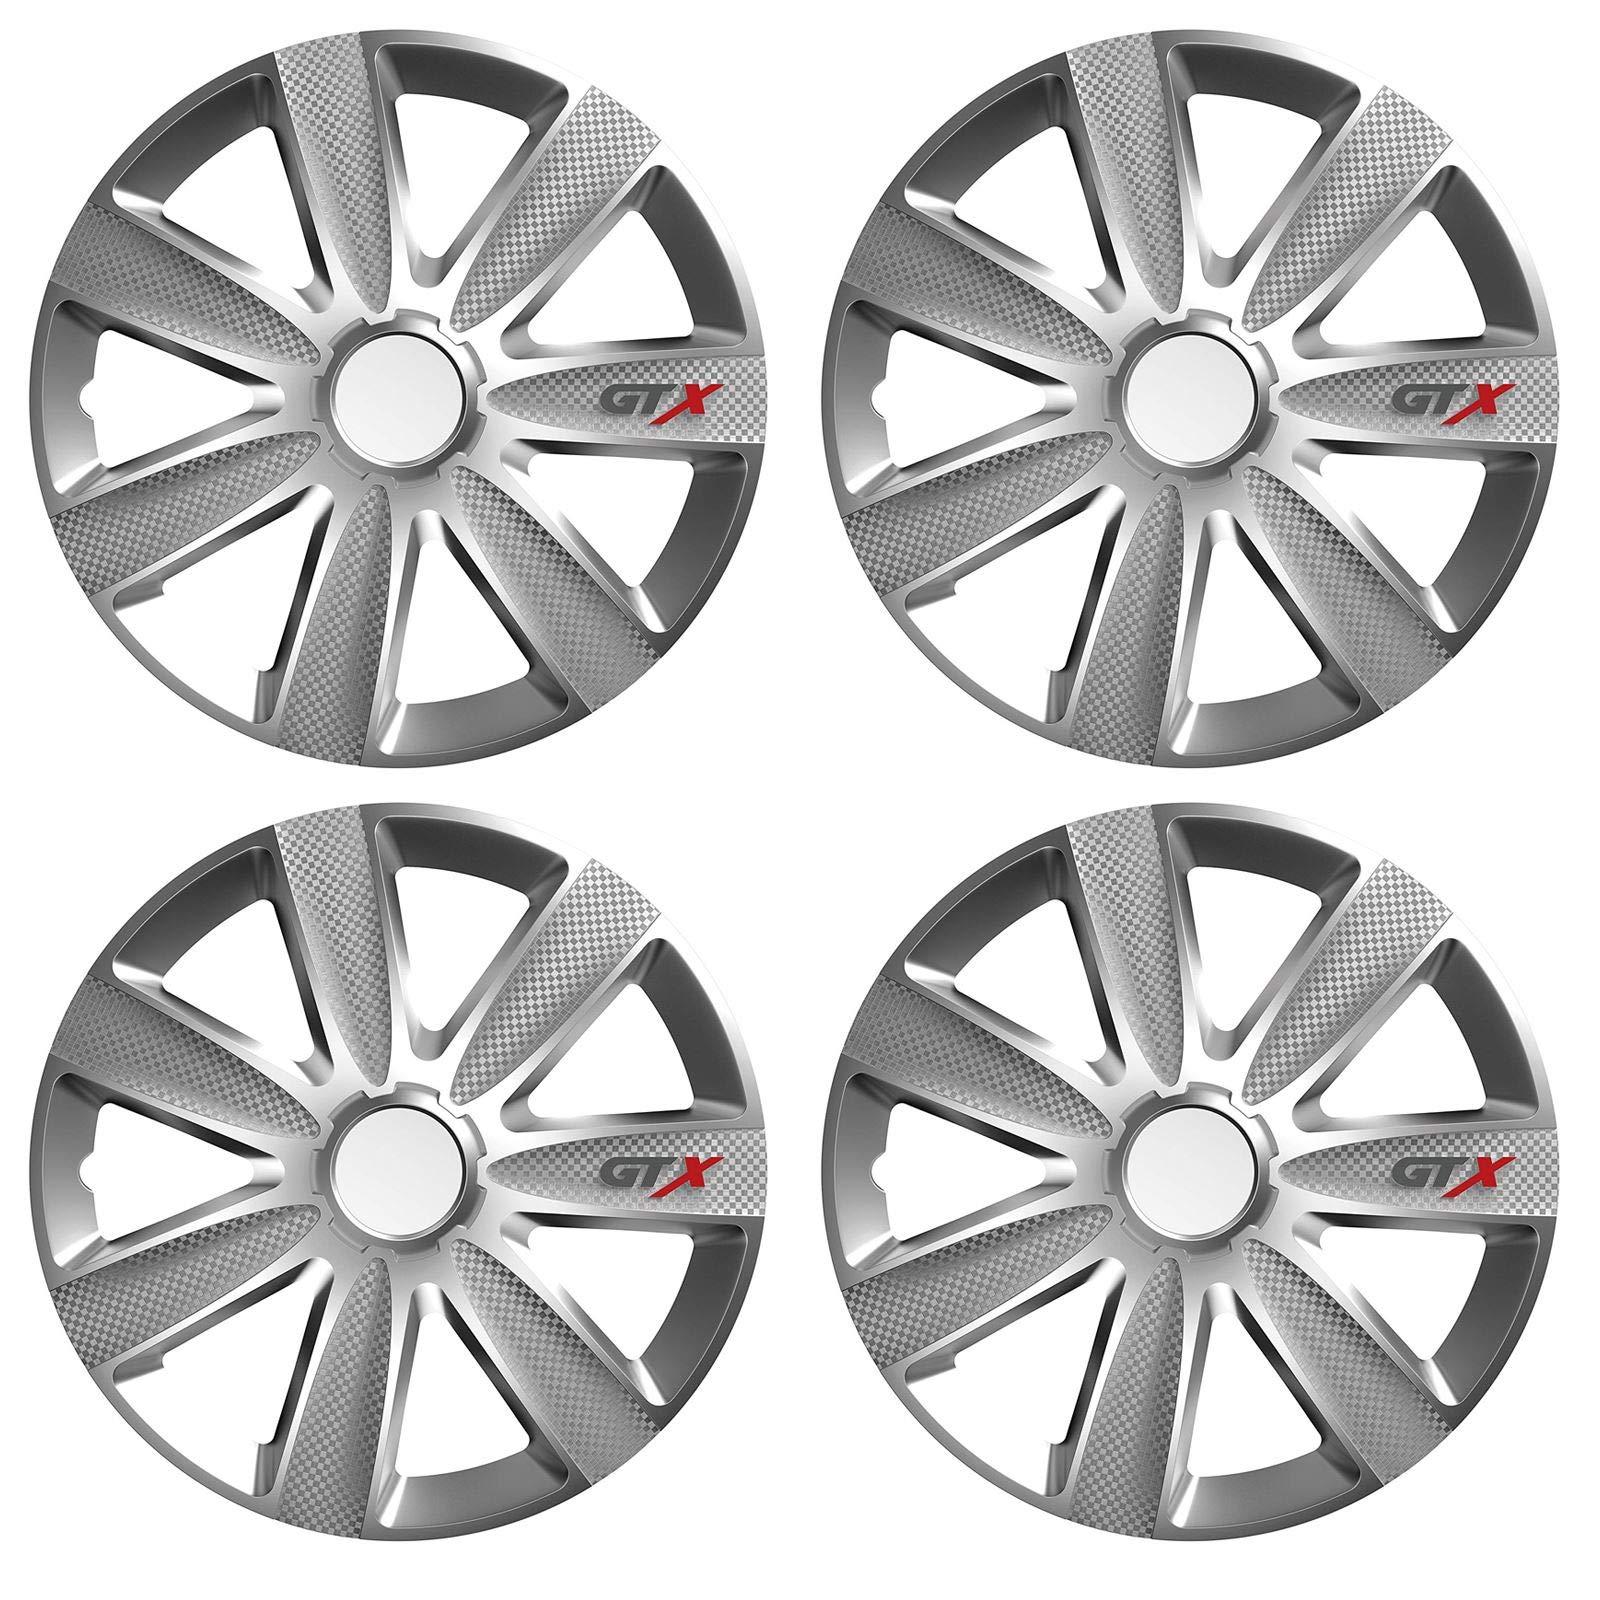 UKB4C 4x Wheel Trims Hub Caps 14 Covers fits Honda Jazz Civic Accord in Silver